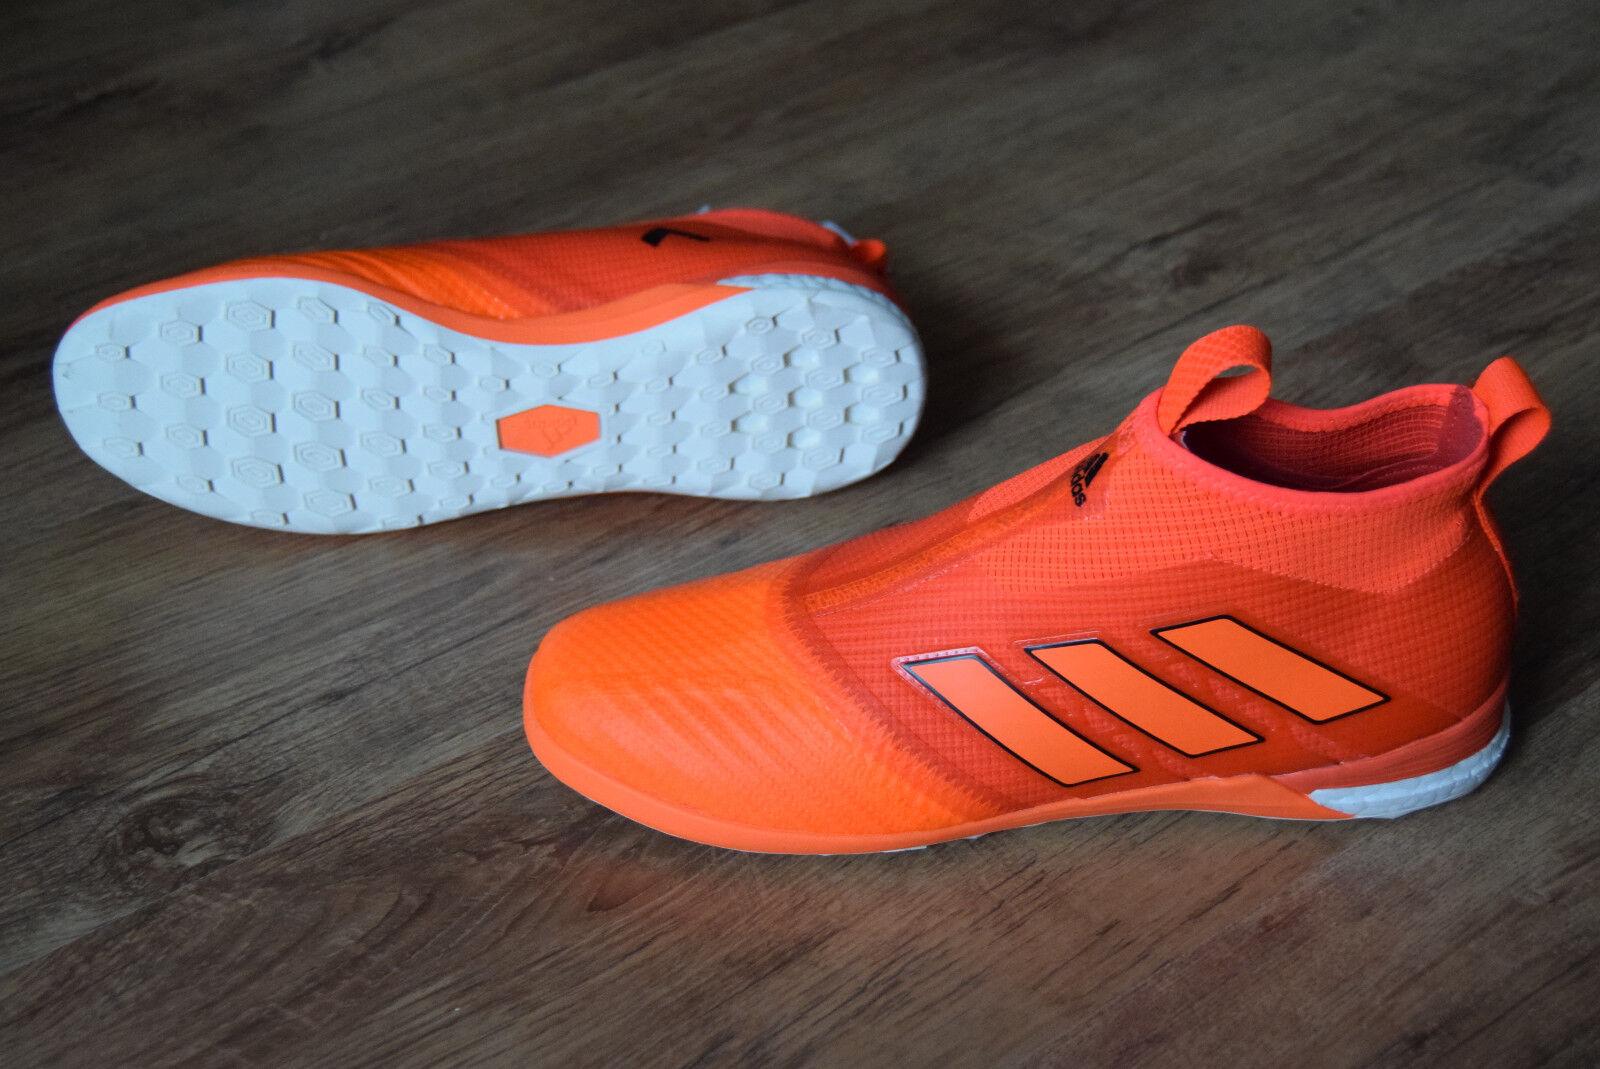 Adidas As Tango 17 + Purecontrol Interior 41 42 43 44 45 46 By2226 Zapatos de